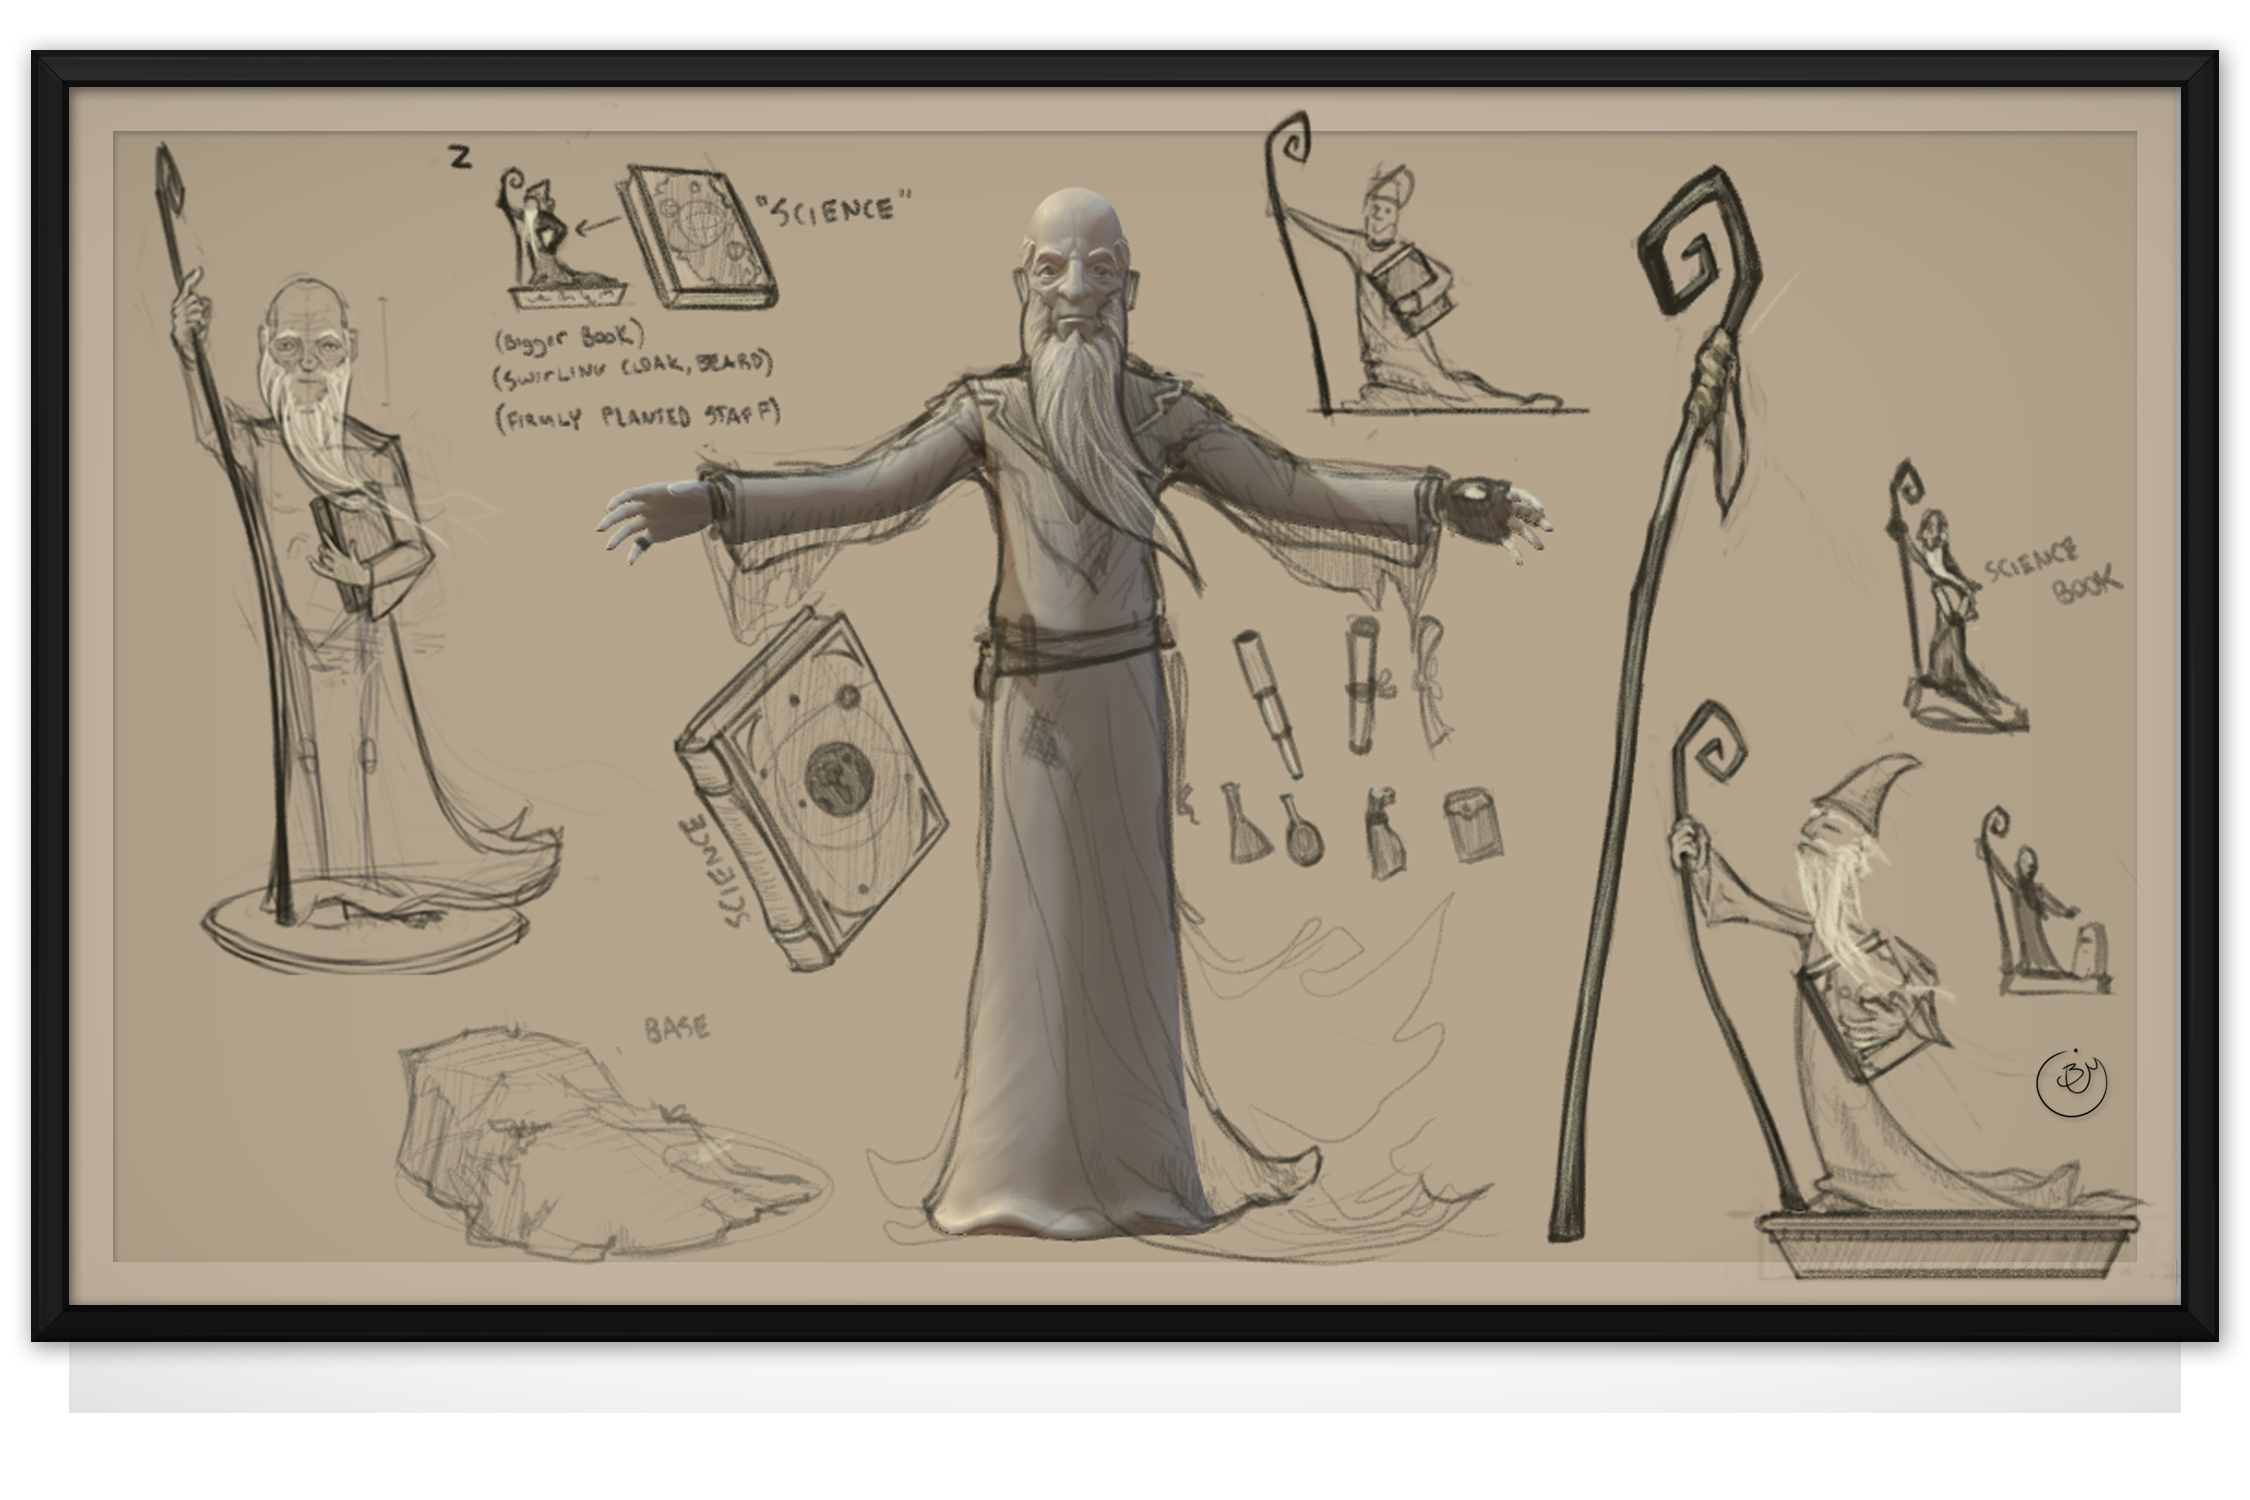 Man of Science (Over Sketch Designs)